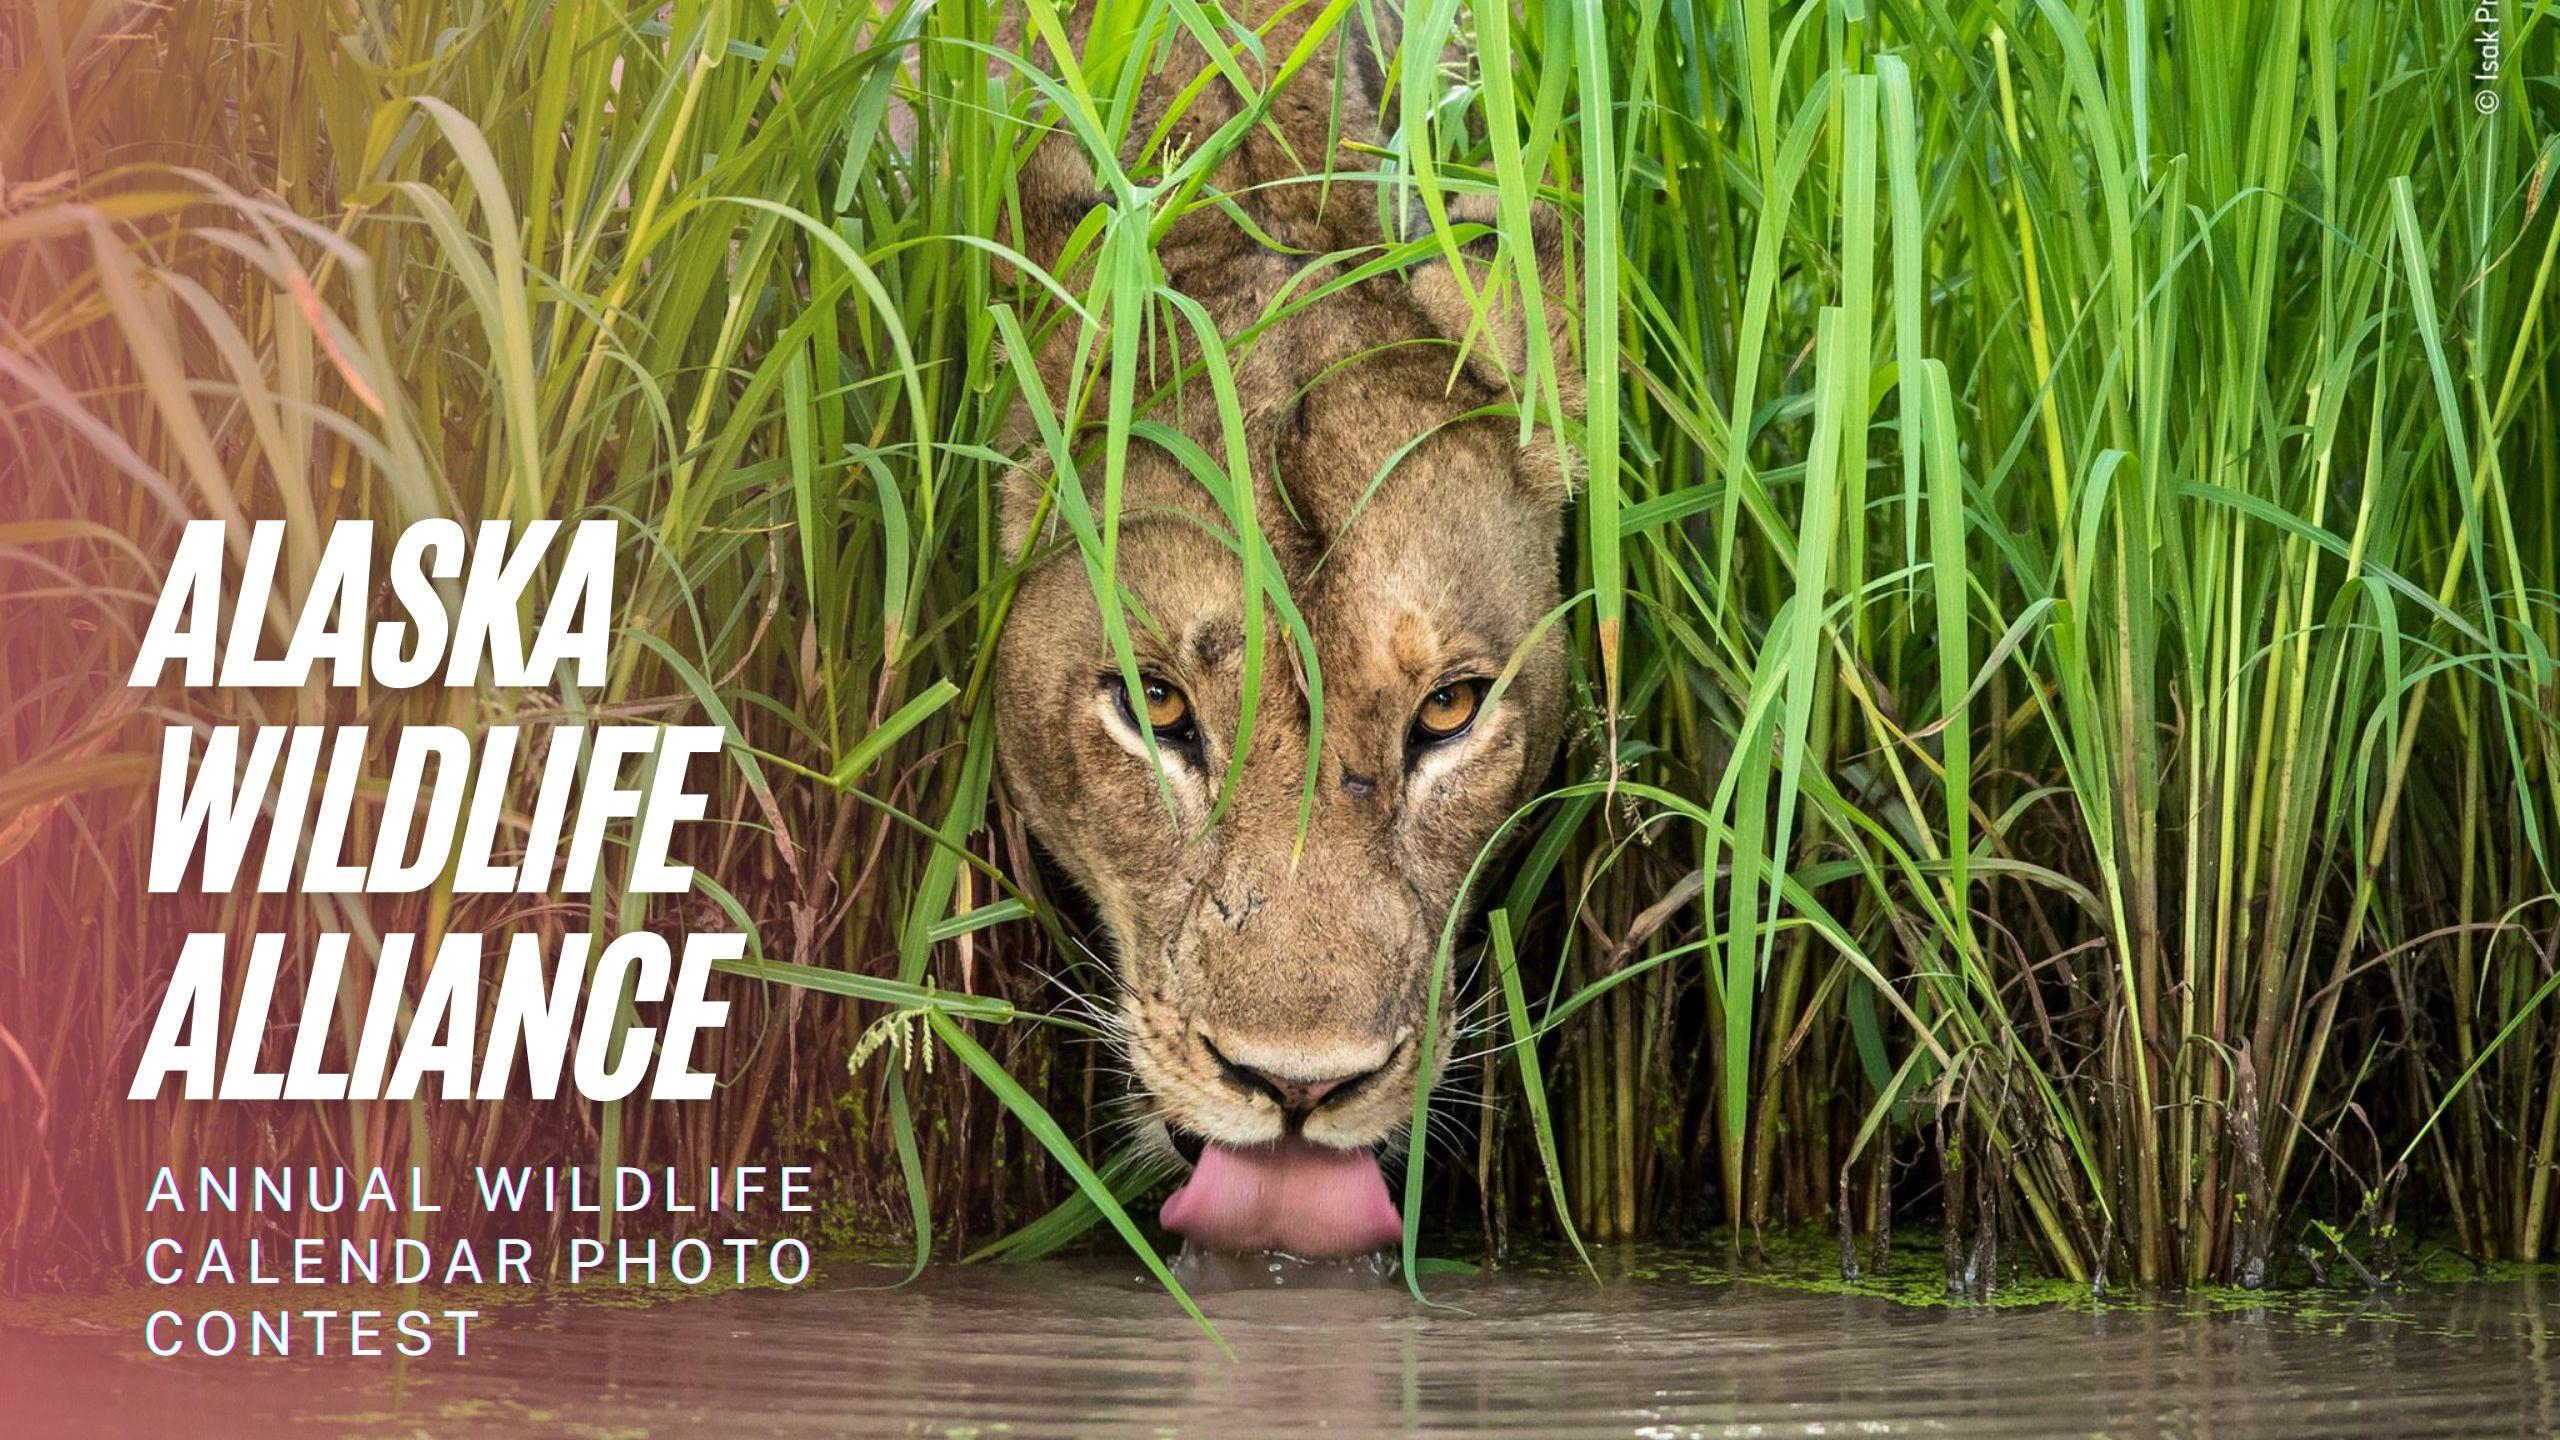 Alaska Wildlife Alliance Annual Wildlife Calendar Photo Contest